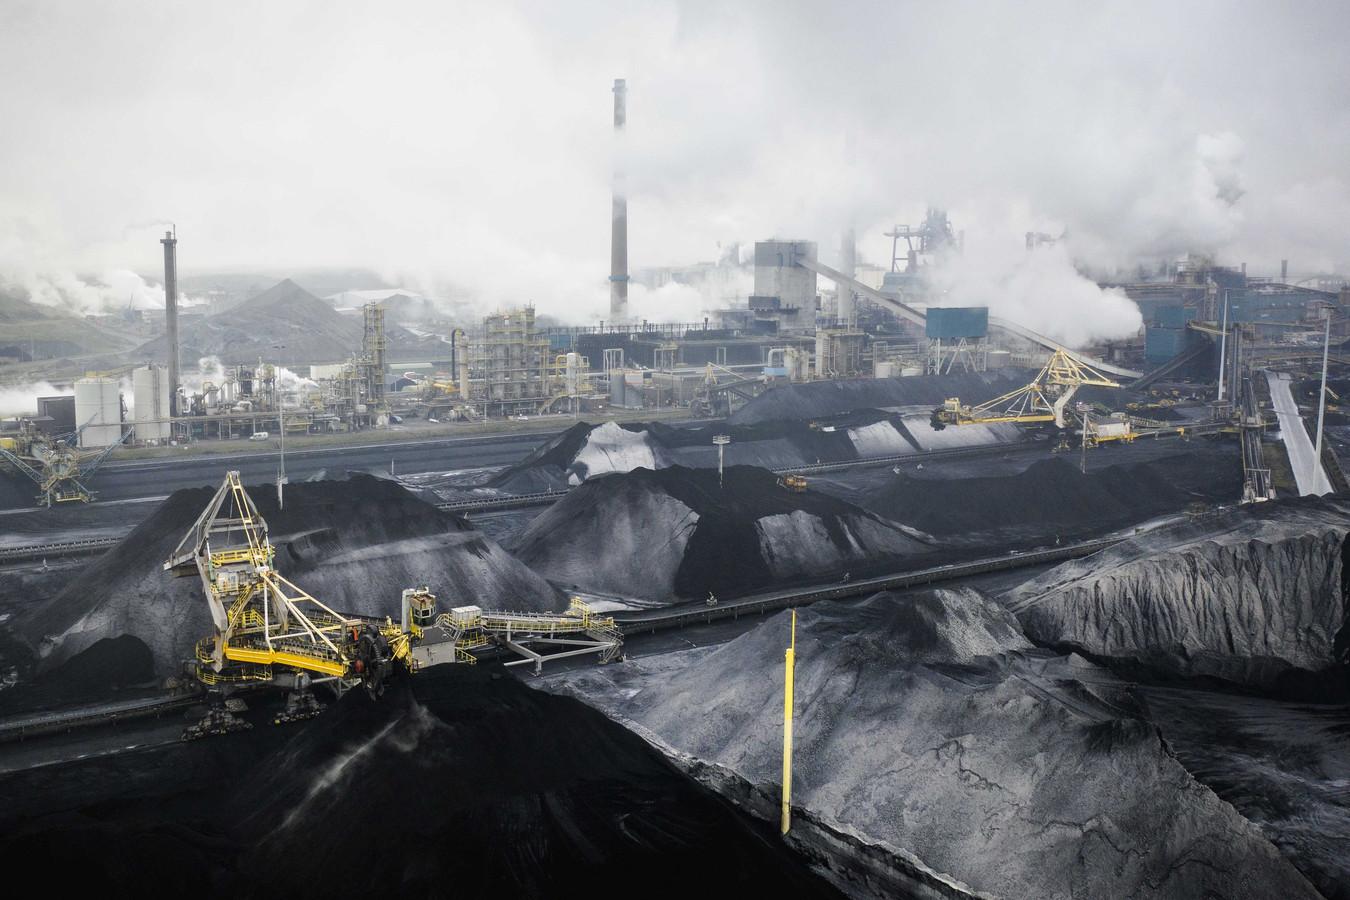 Dronefoto van staalfabrikant Tata Steel.